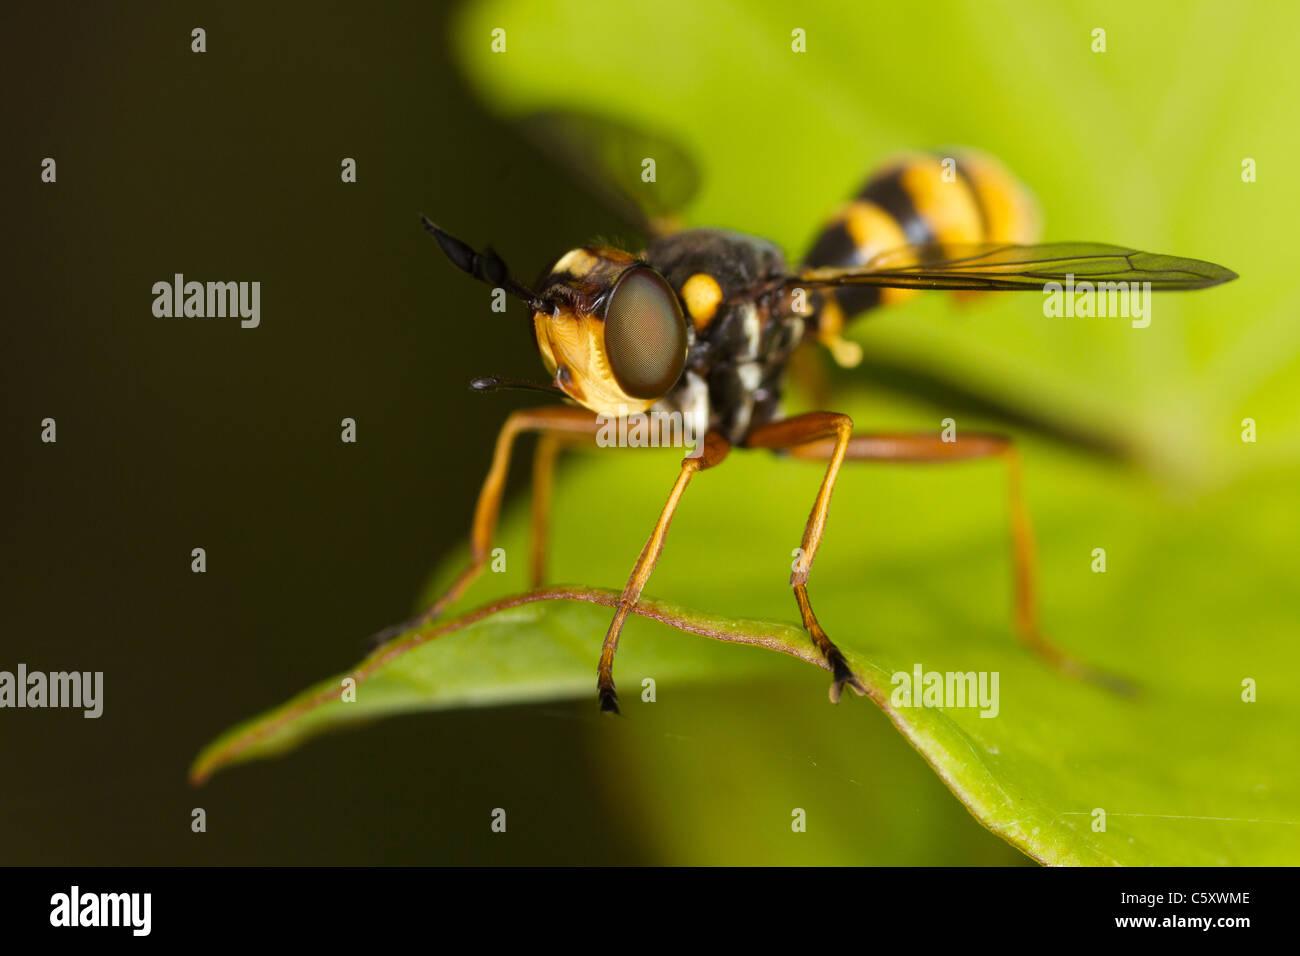 Wasp-Mimic Hummel Parasit Conops Quadrifasciatus sitzt auf einem Blatt Stockbild